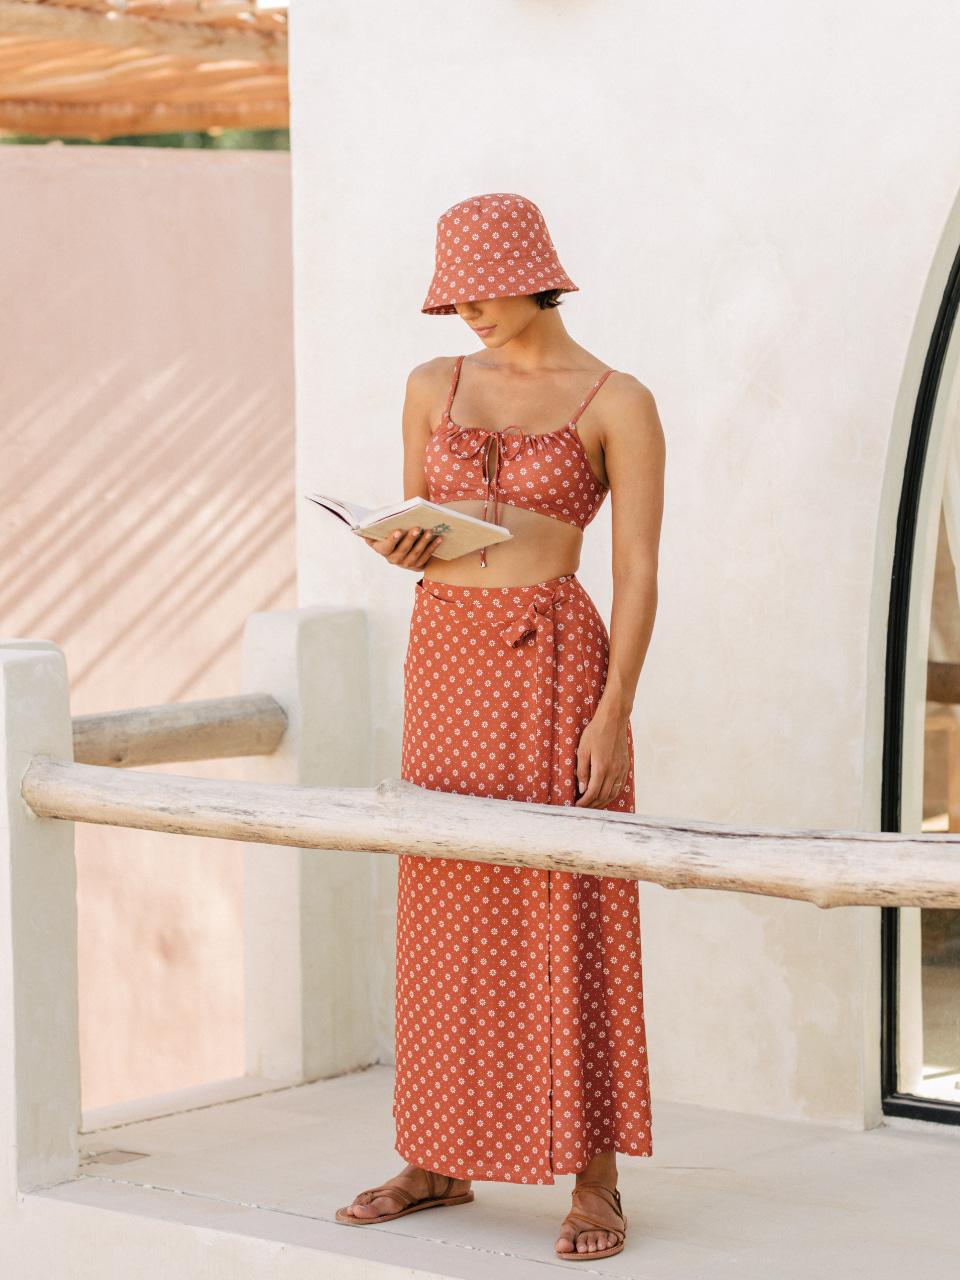 TERRA LONG SKIRTswimwear,수영복,비키니,데이즈데이즈,dazedayz,디자이너수영복,디자이너스위웨어,디자이너수영복,리조트웨어,